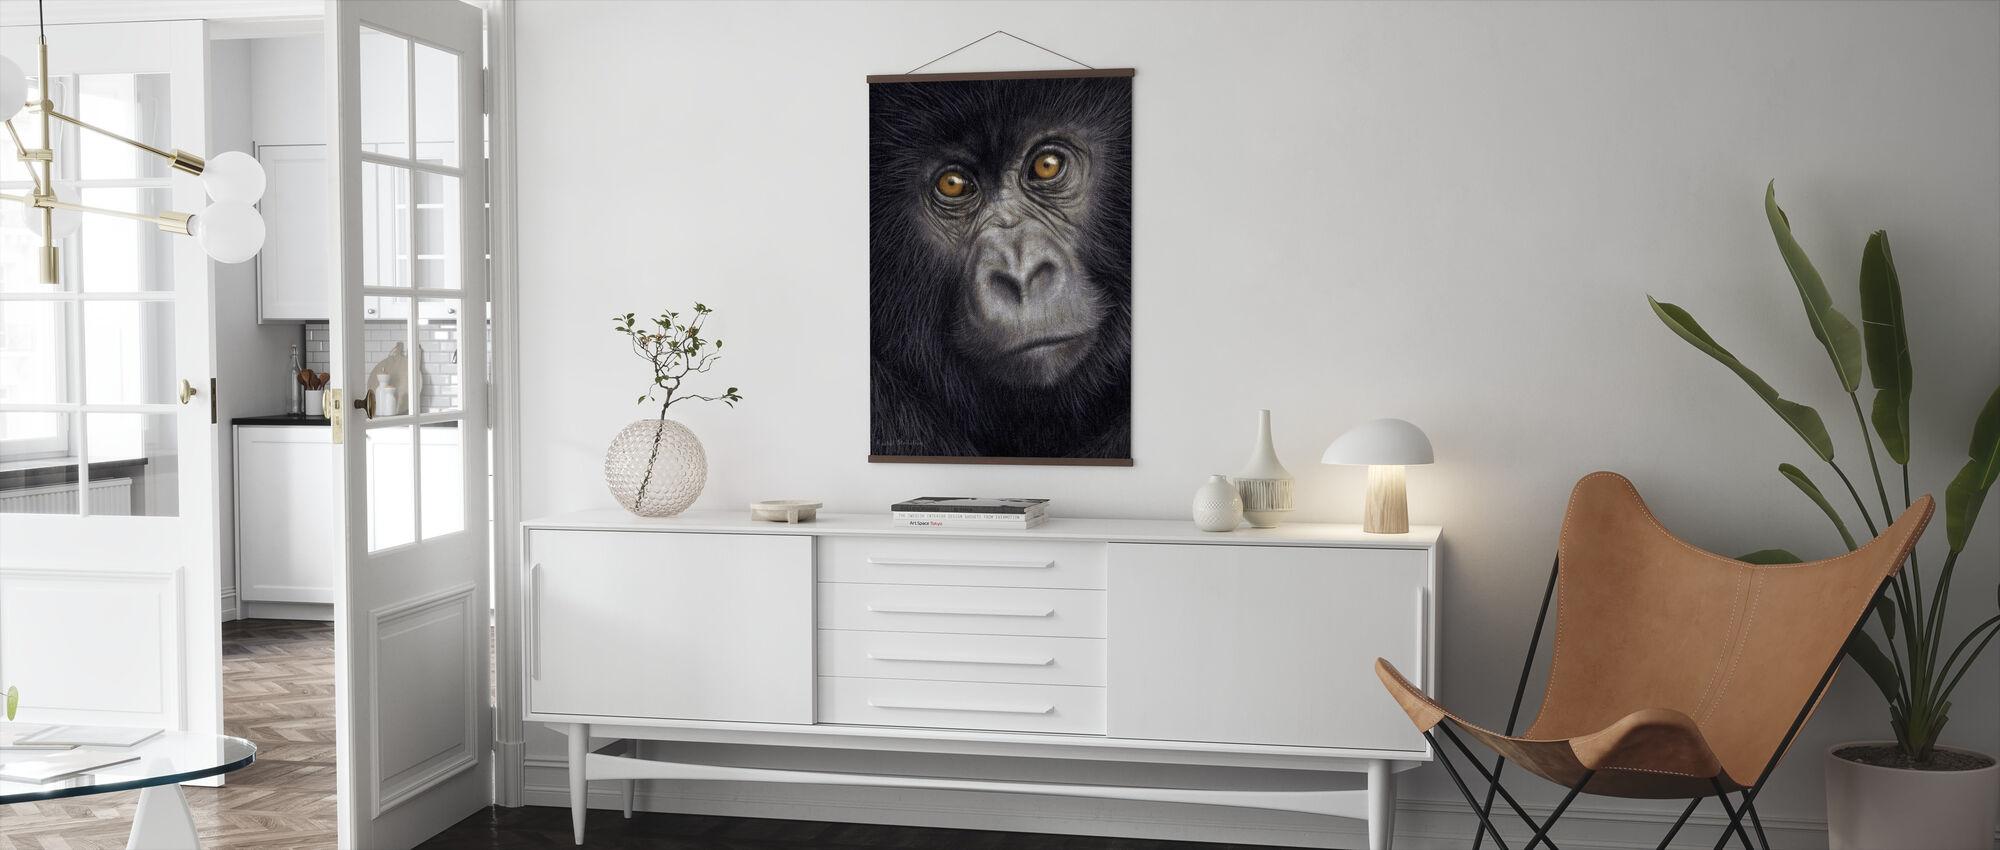 Unge Fjell Gorilla - Plakat - Stue